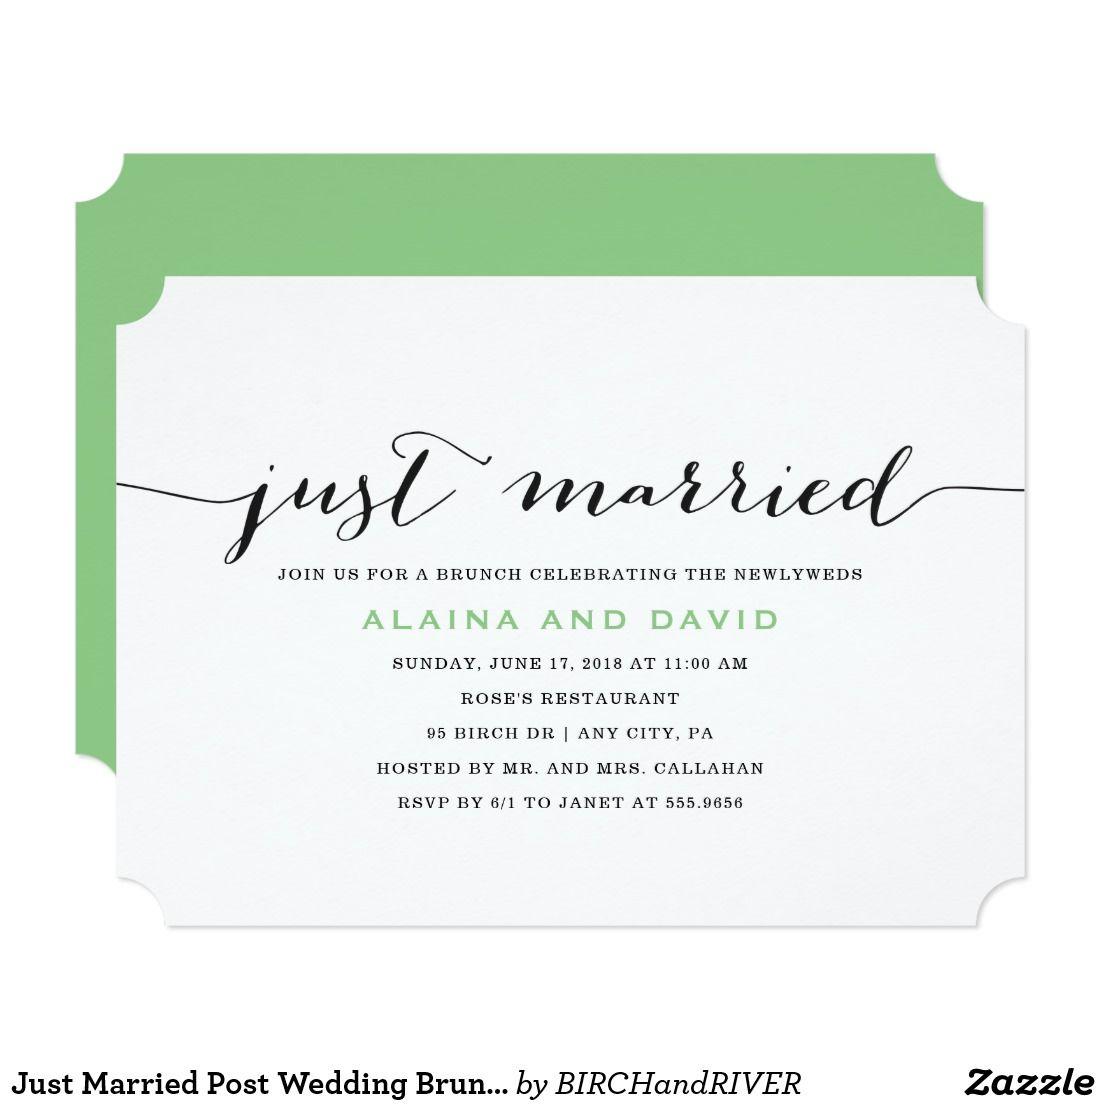 Just Married Post Wedding Brunch Invitation | Pinterest | Brunch ...